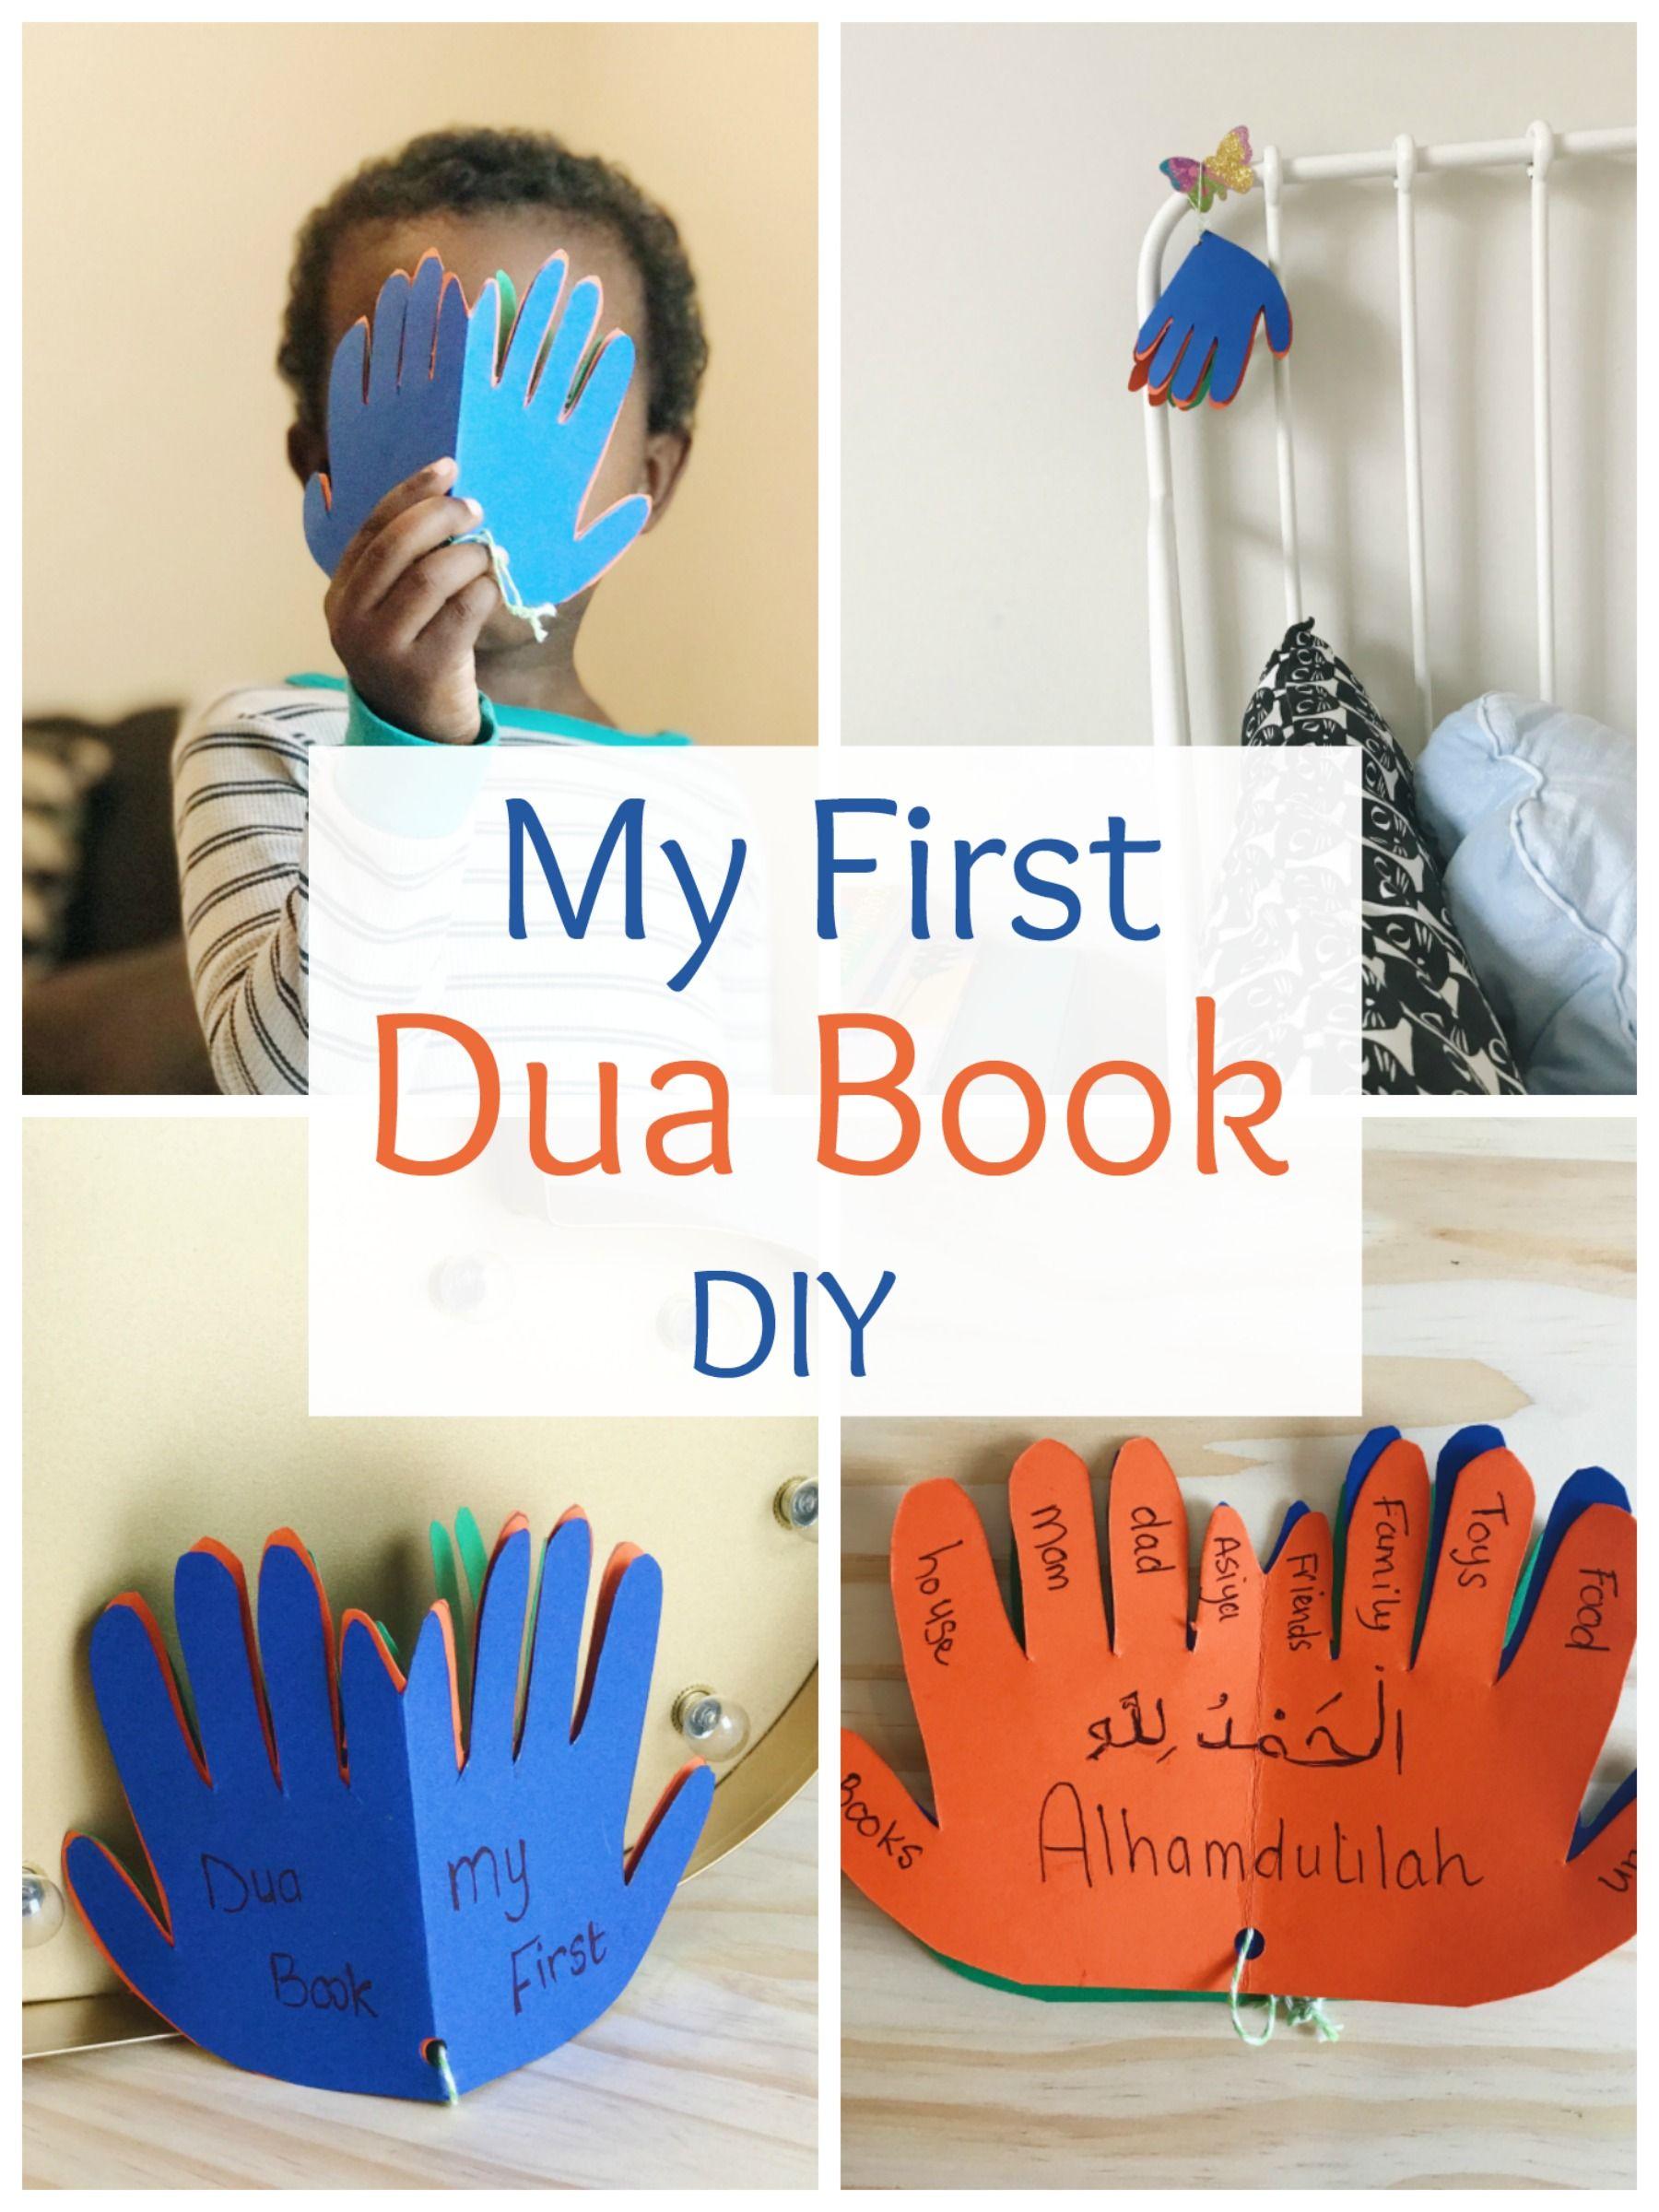 My First Dua Book Diy The Muslimah Guide Ramadan Kids Islamic Kids Activities Ramadan Crafts